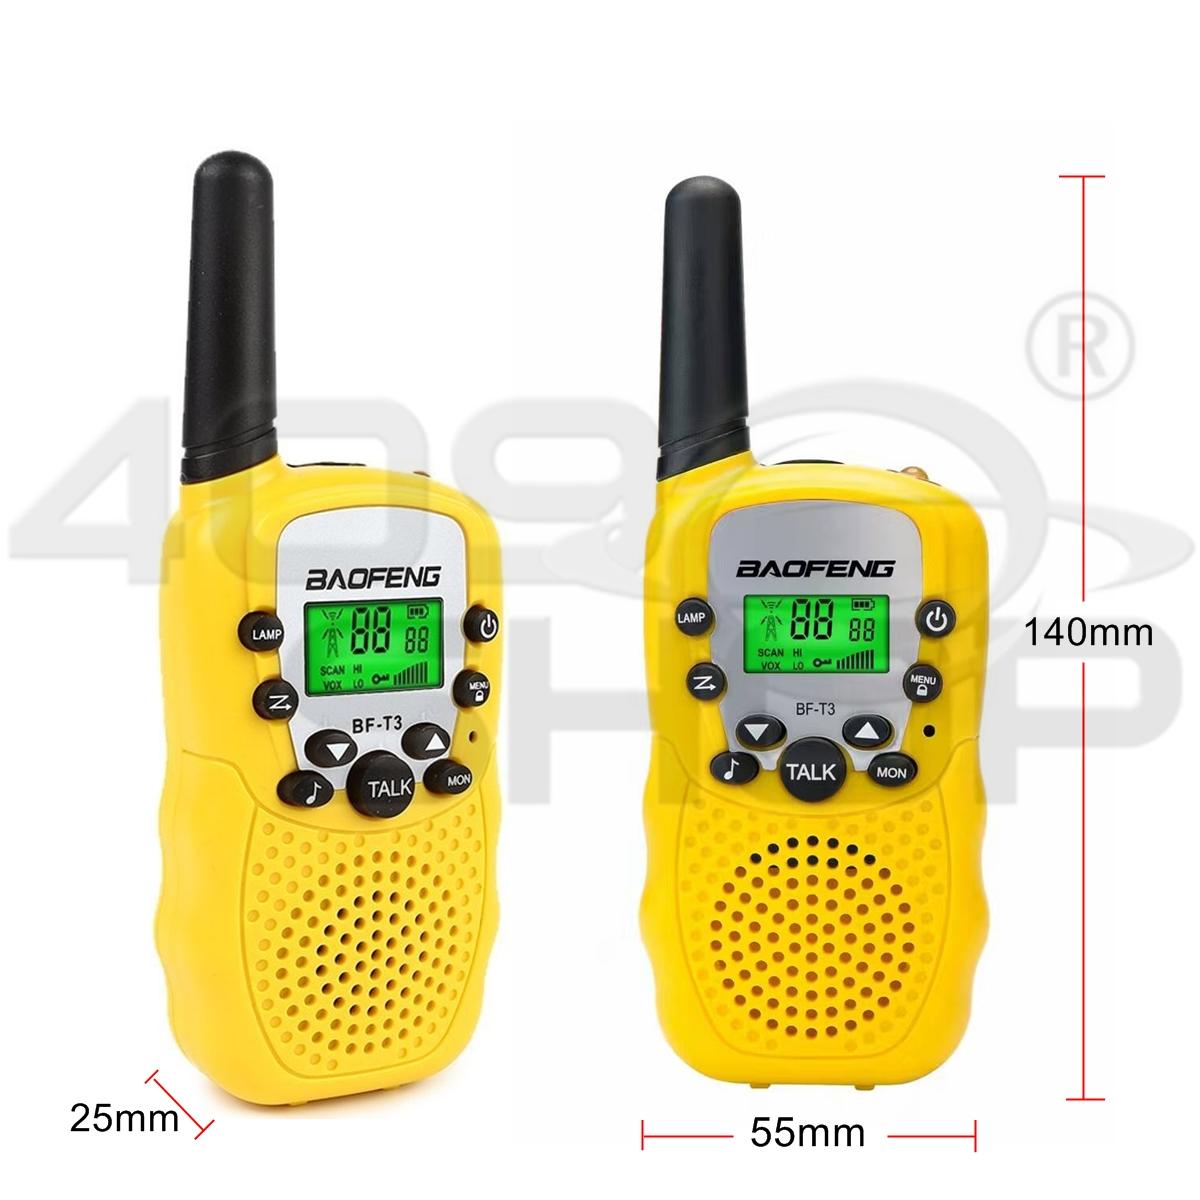 2x Baofeng BF-T3 YELLOW Handheld Walkie Talkie UHF Mini Two Way Radio Interphone